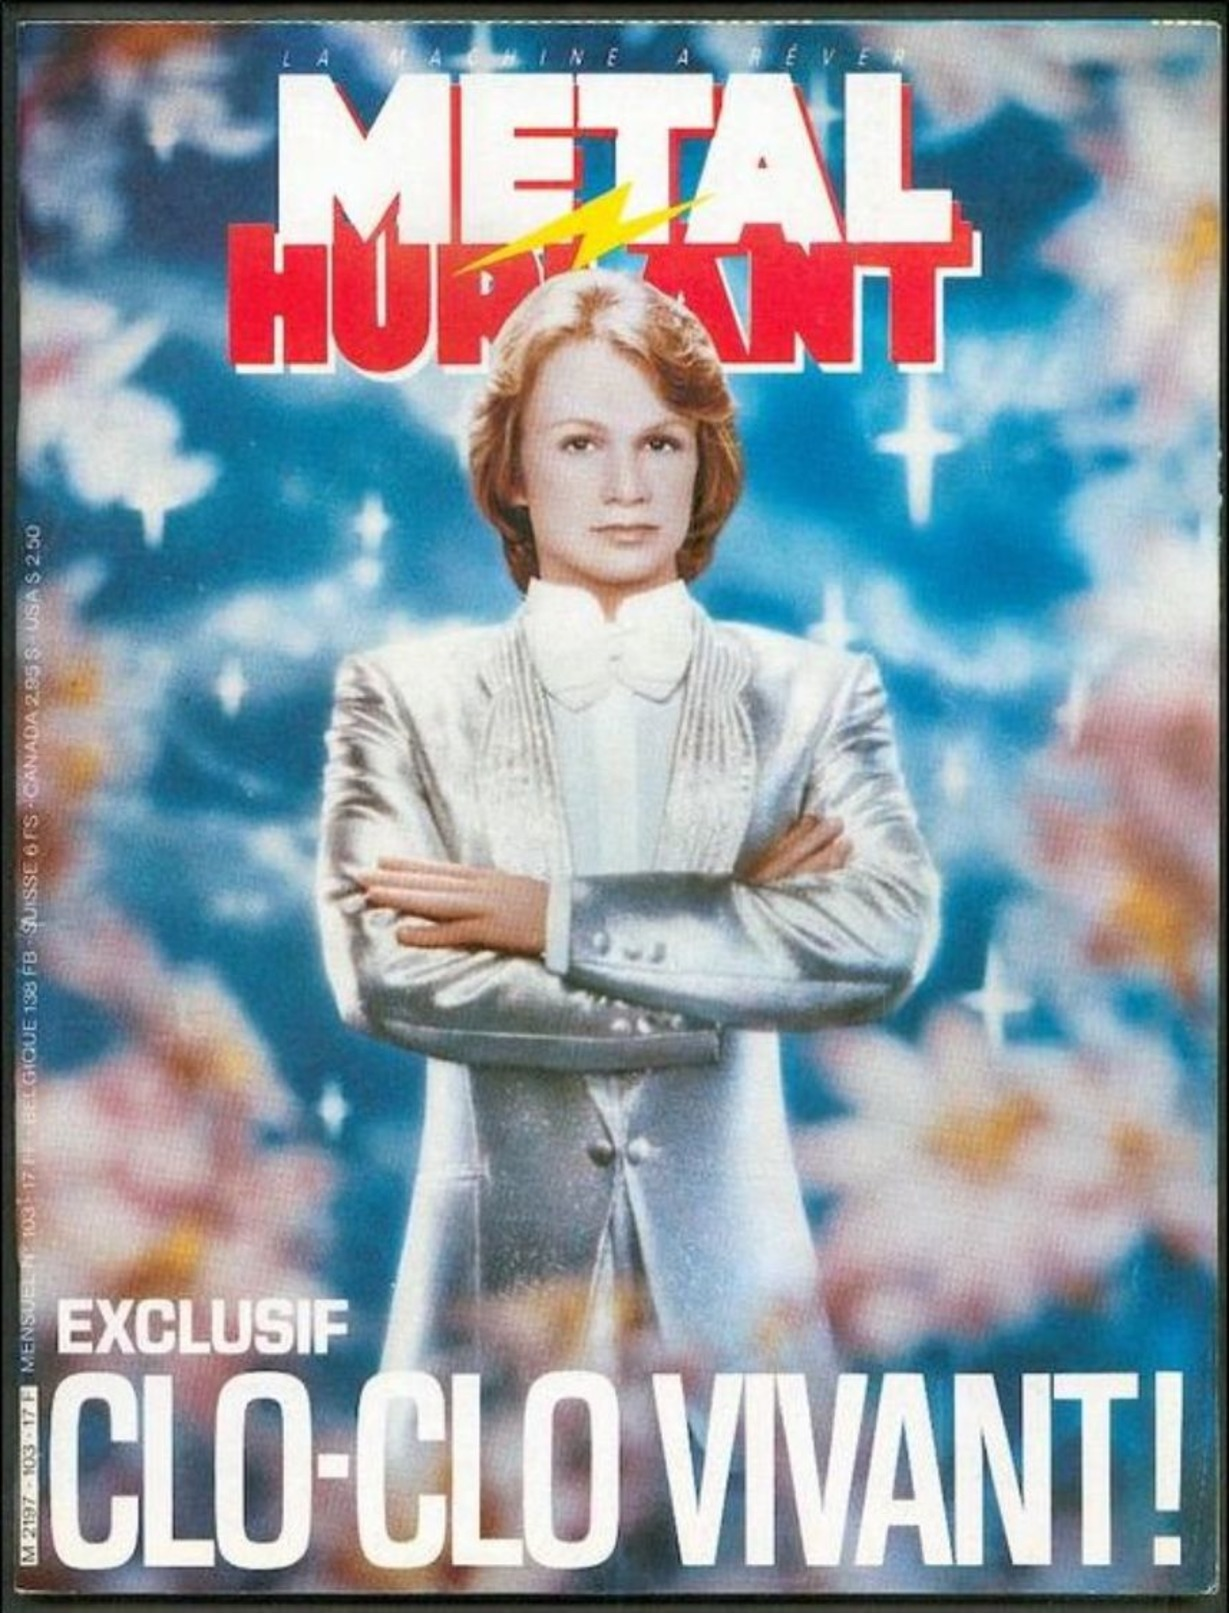 No PAYPAL !! : Metal Hurlant 103 CLO-CLO VIVANT ( Claude François ),Floch Caro Schuiten Andreas Yves Chaland Pirus 1984 - Métal Hurlant